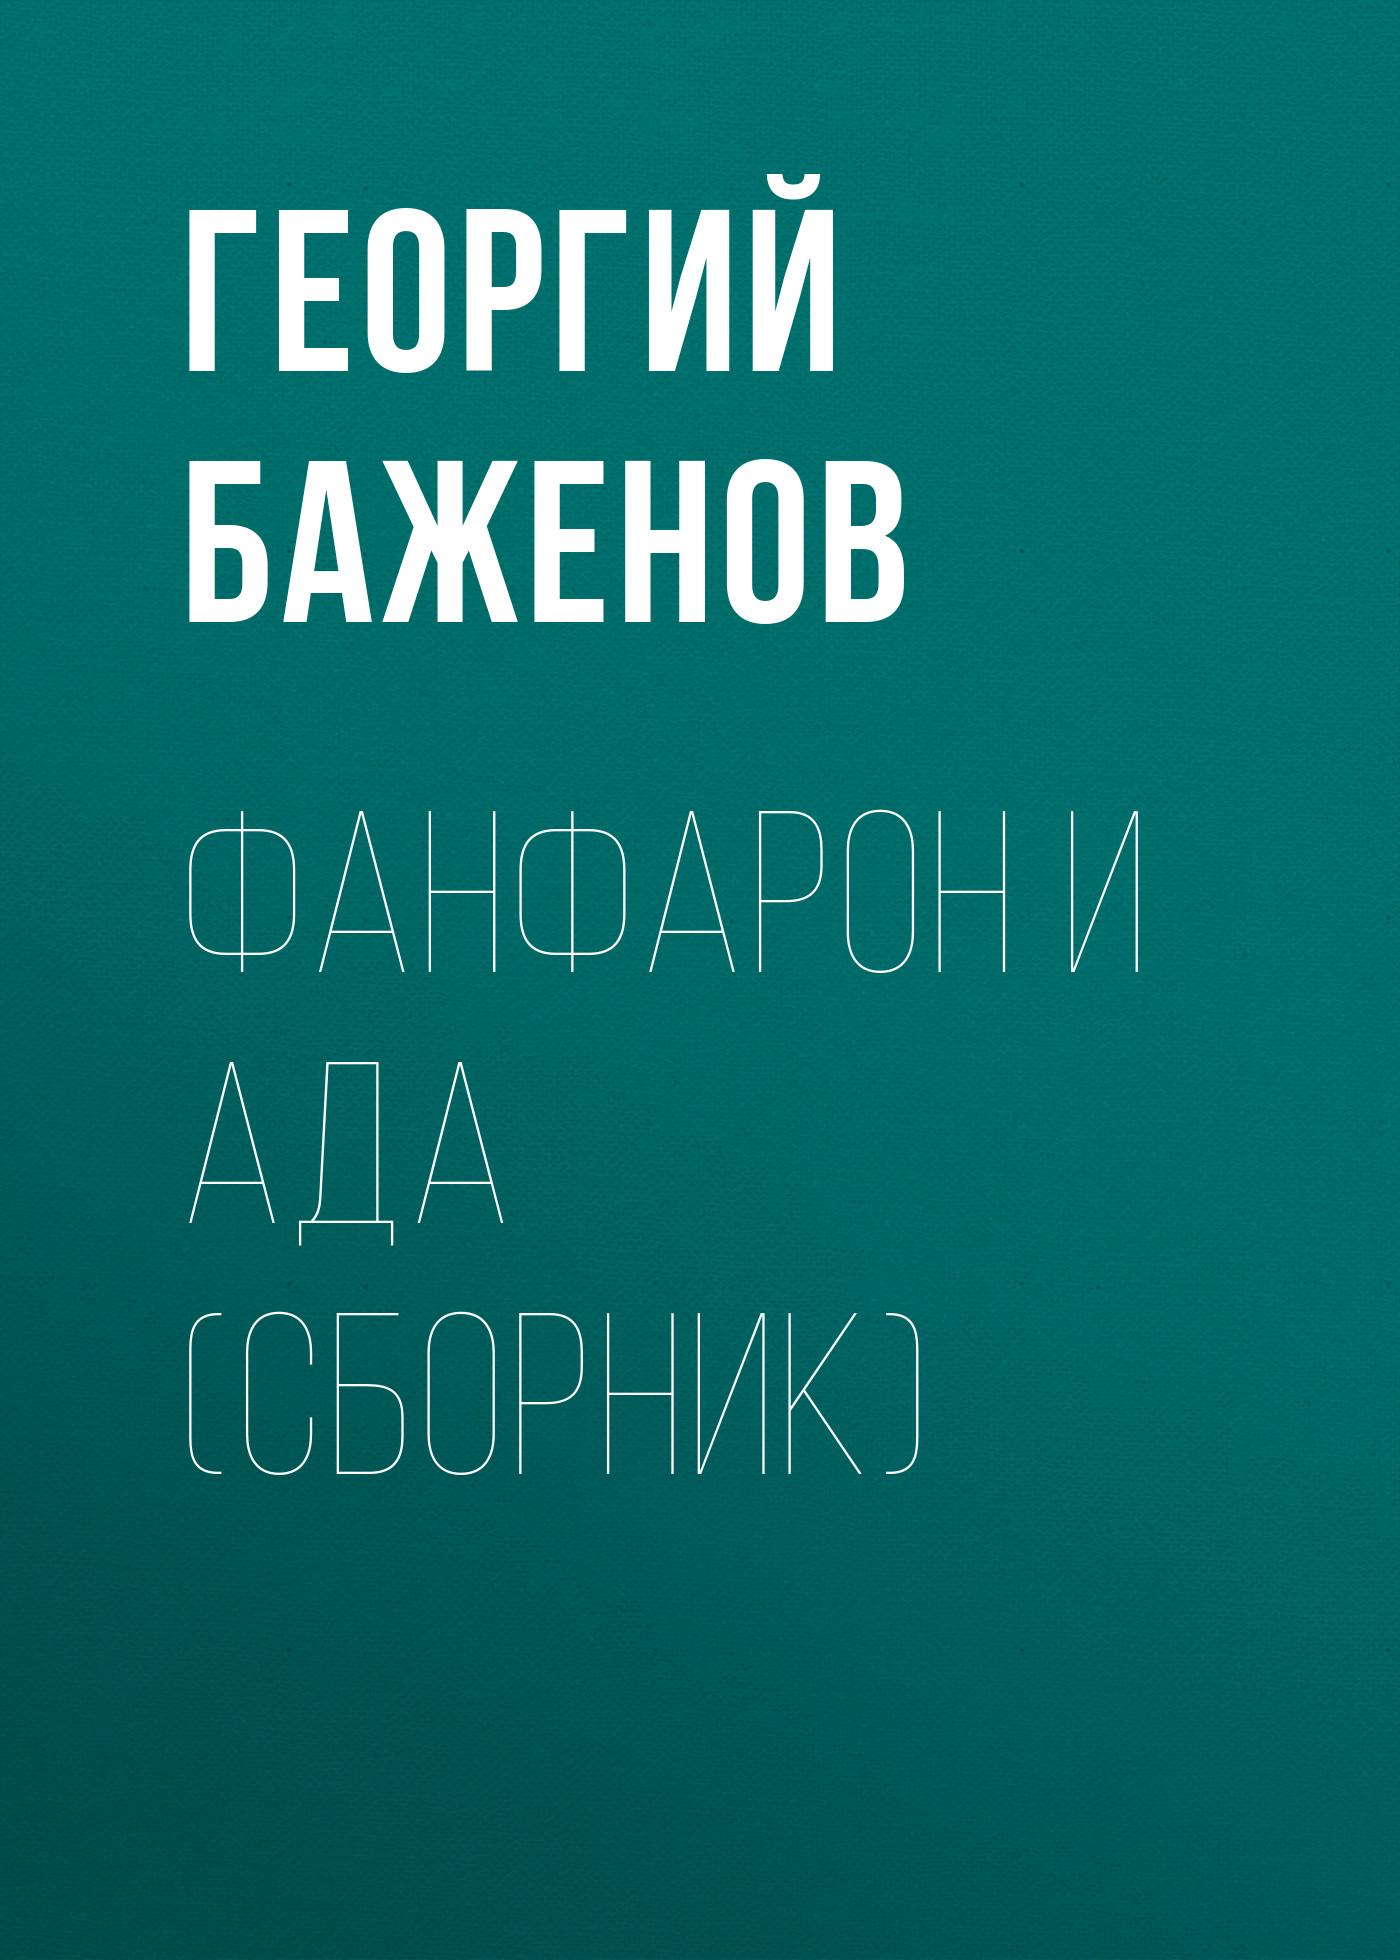 Георгий Баженов Фанфарон и Ада (сборник) баженов георгий похищение любви